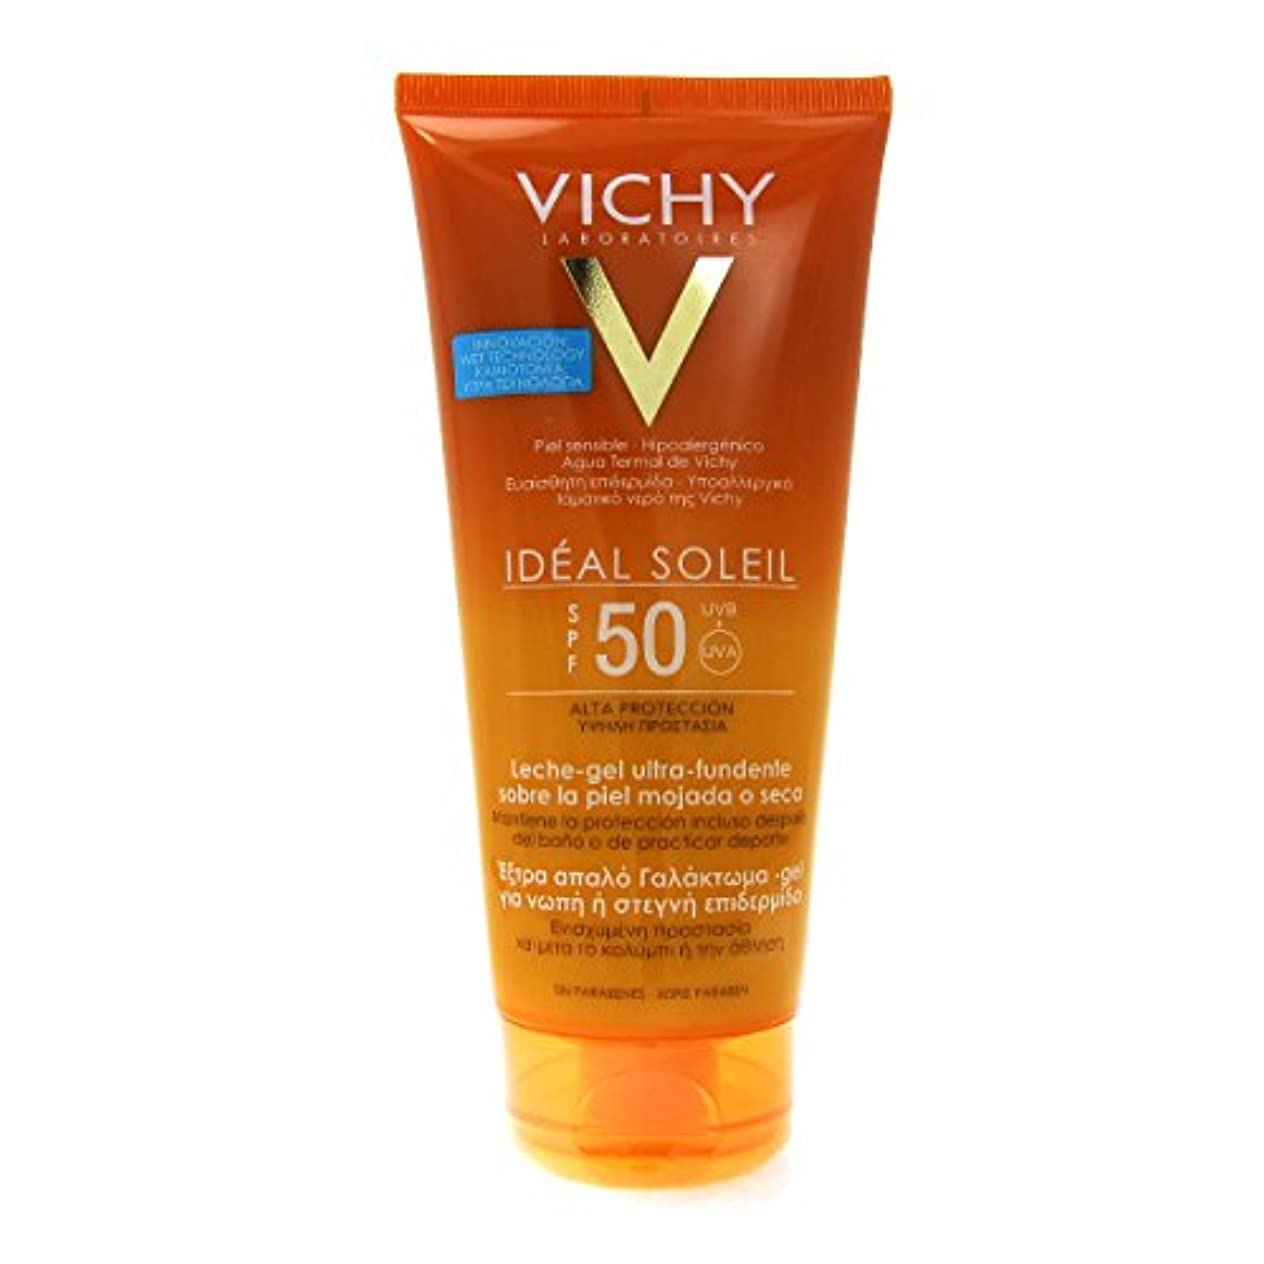 登録暴徒石Vichy Capital Soleil Ideal Soleil Gel-cream Spf50 Face And Body 200ml [並行輸入品]